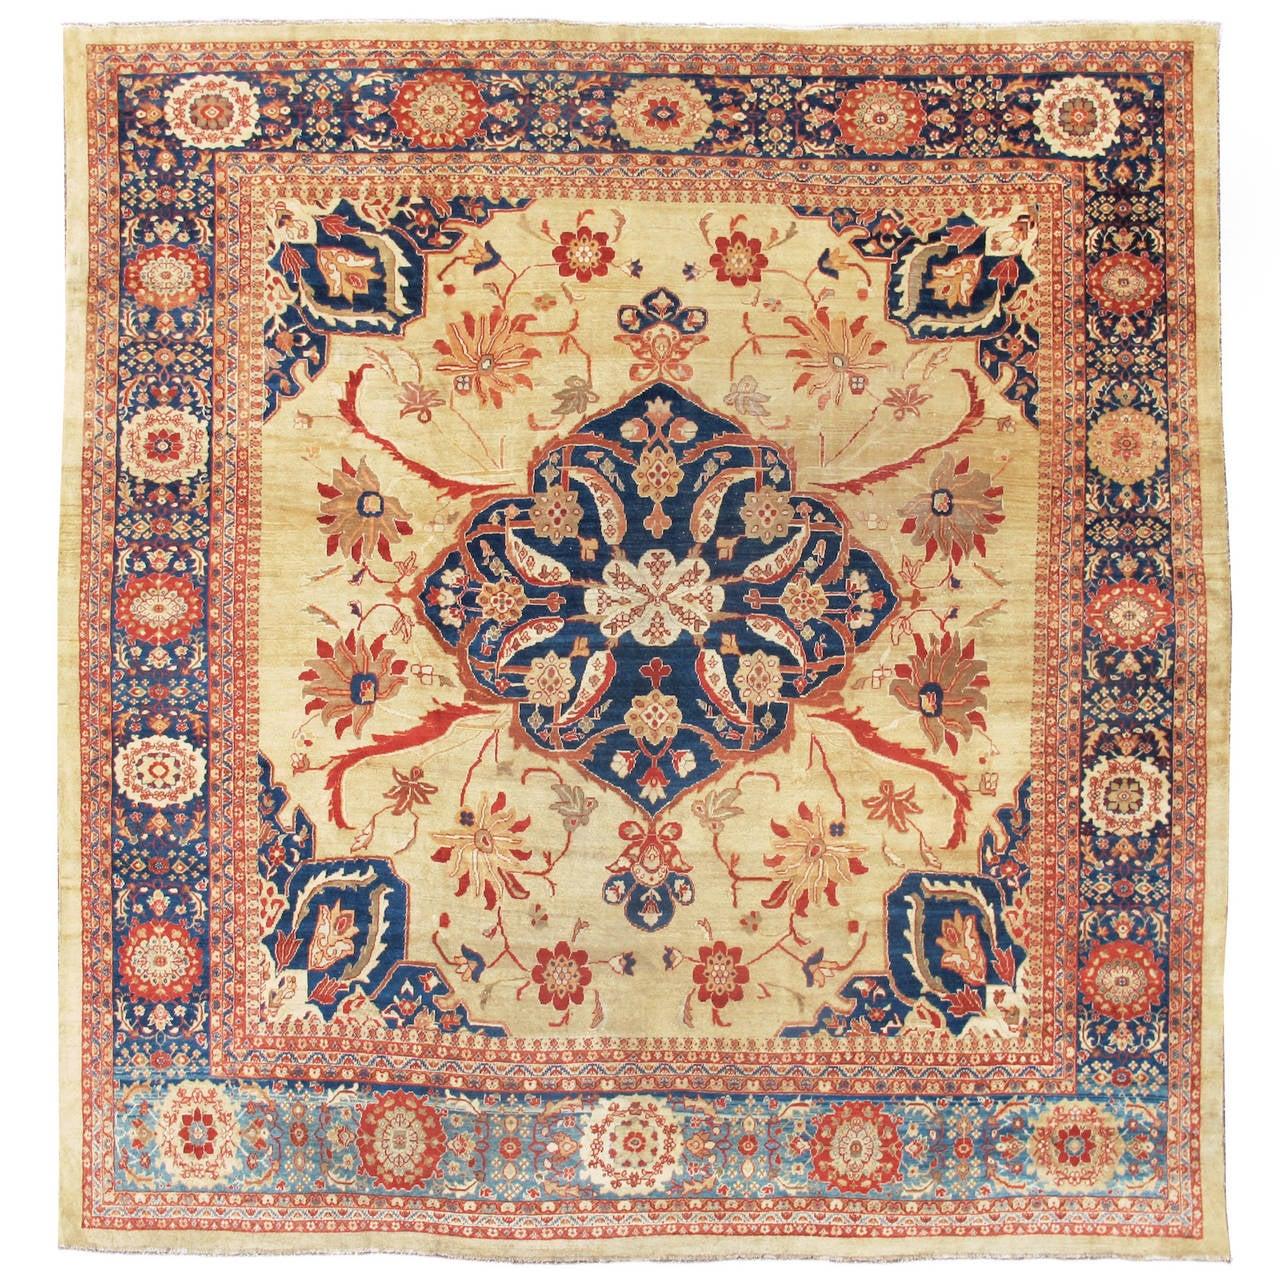 Late 19th Century Blue and Light Tan Ziegler Mahal Carpet